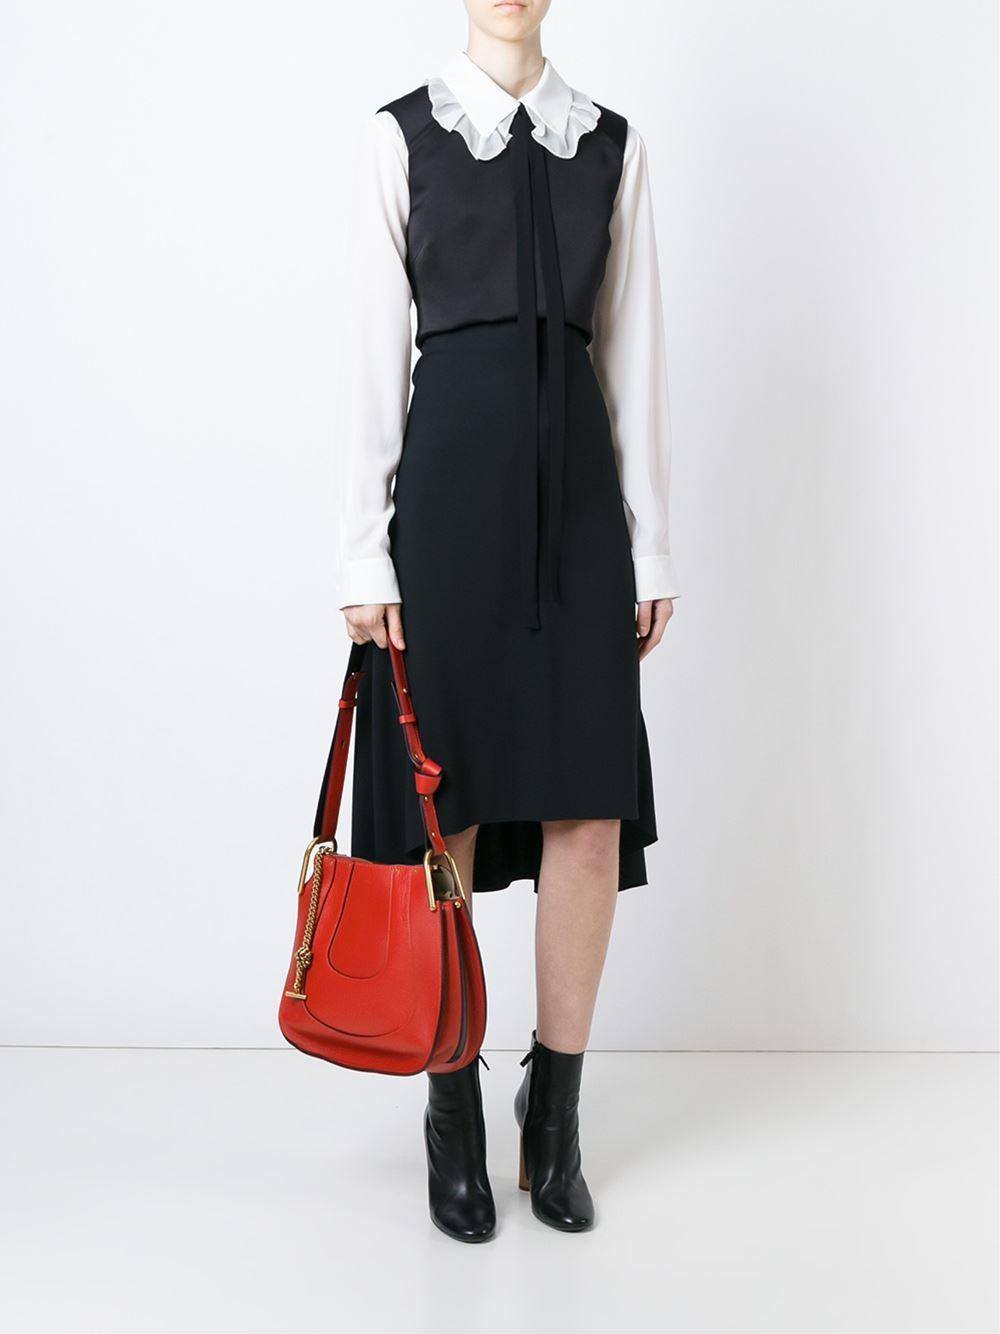 chloe replica handbag - Chlo�� \u0026#39;hayley\u0026#39; Shoulder Bag in Red | Lyst